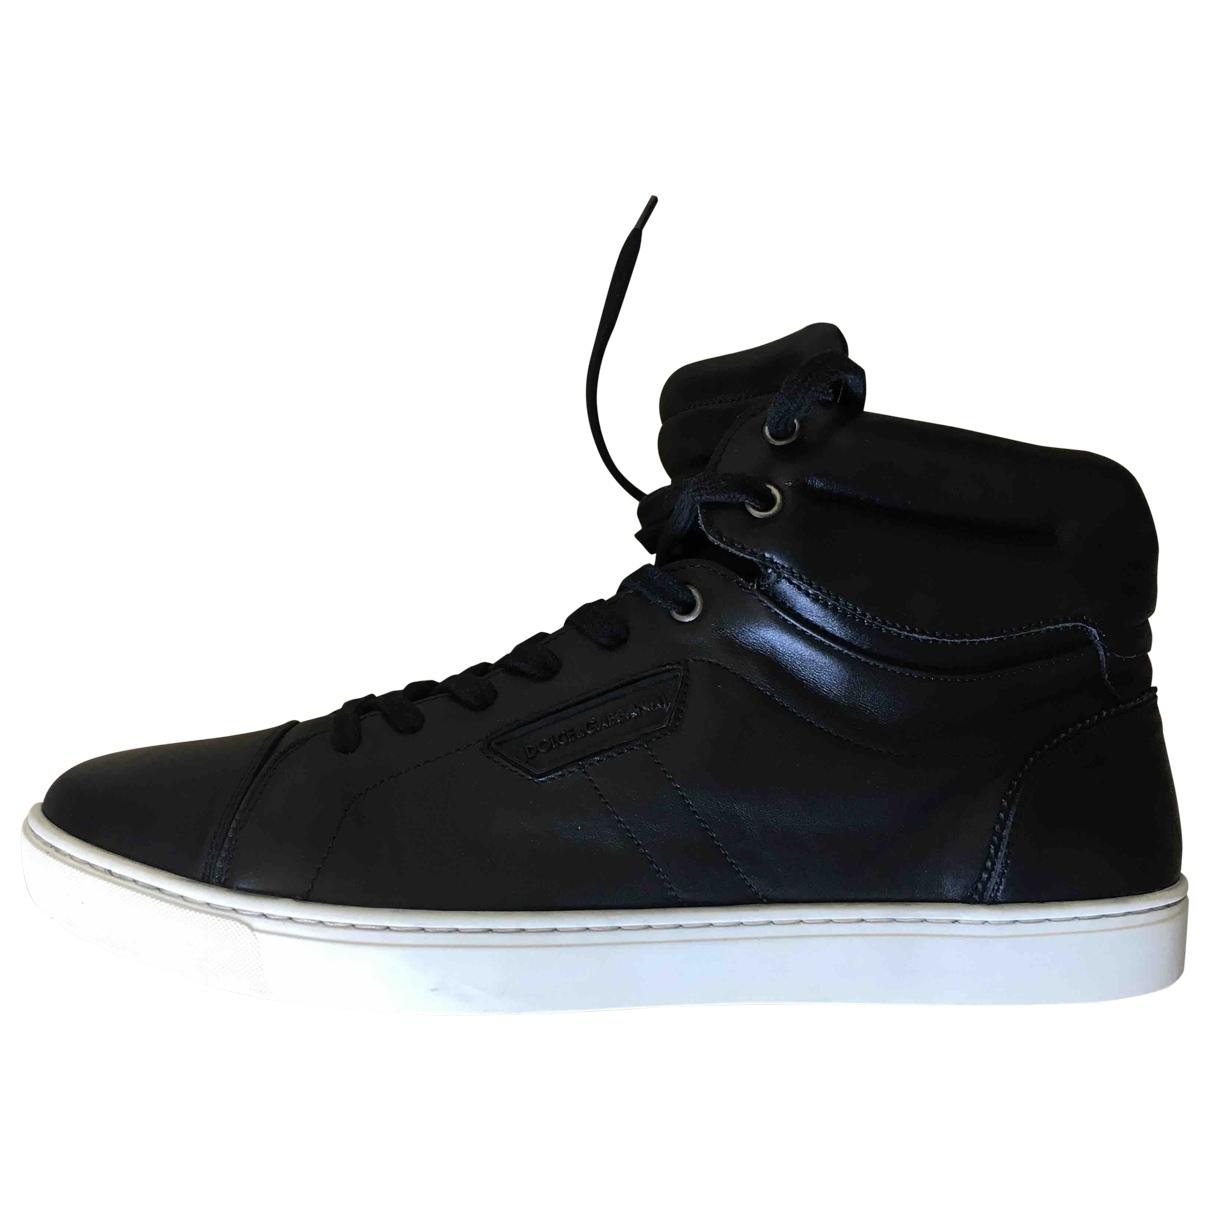 Dolce & Gabbana \N Black Leather Trainers for Men 44 EU